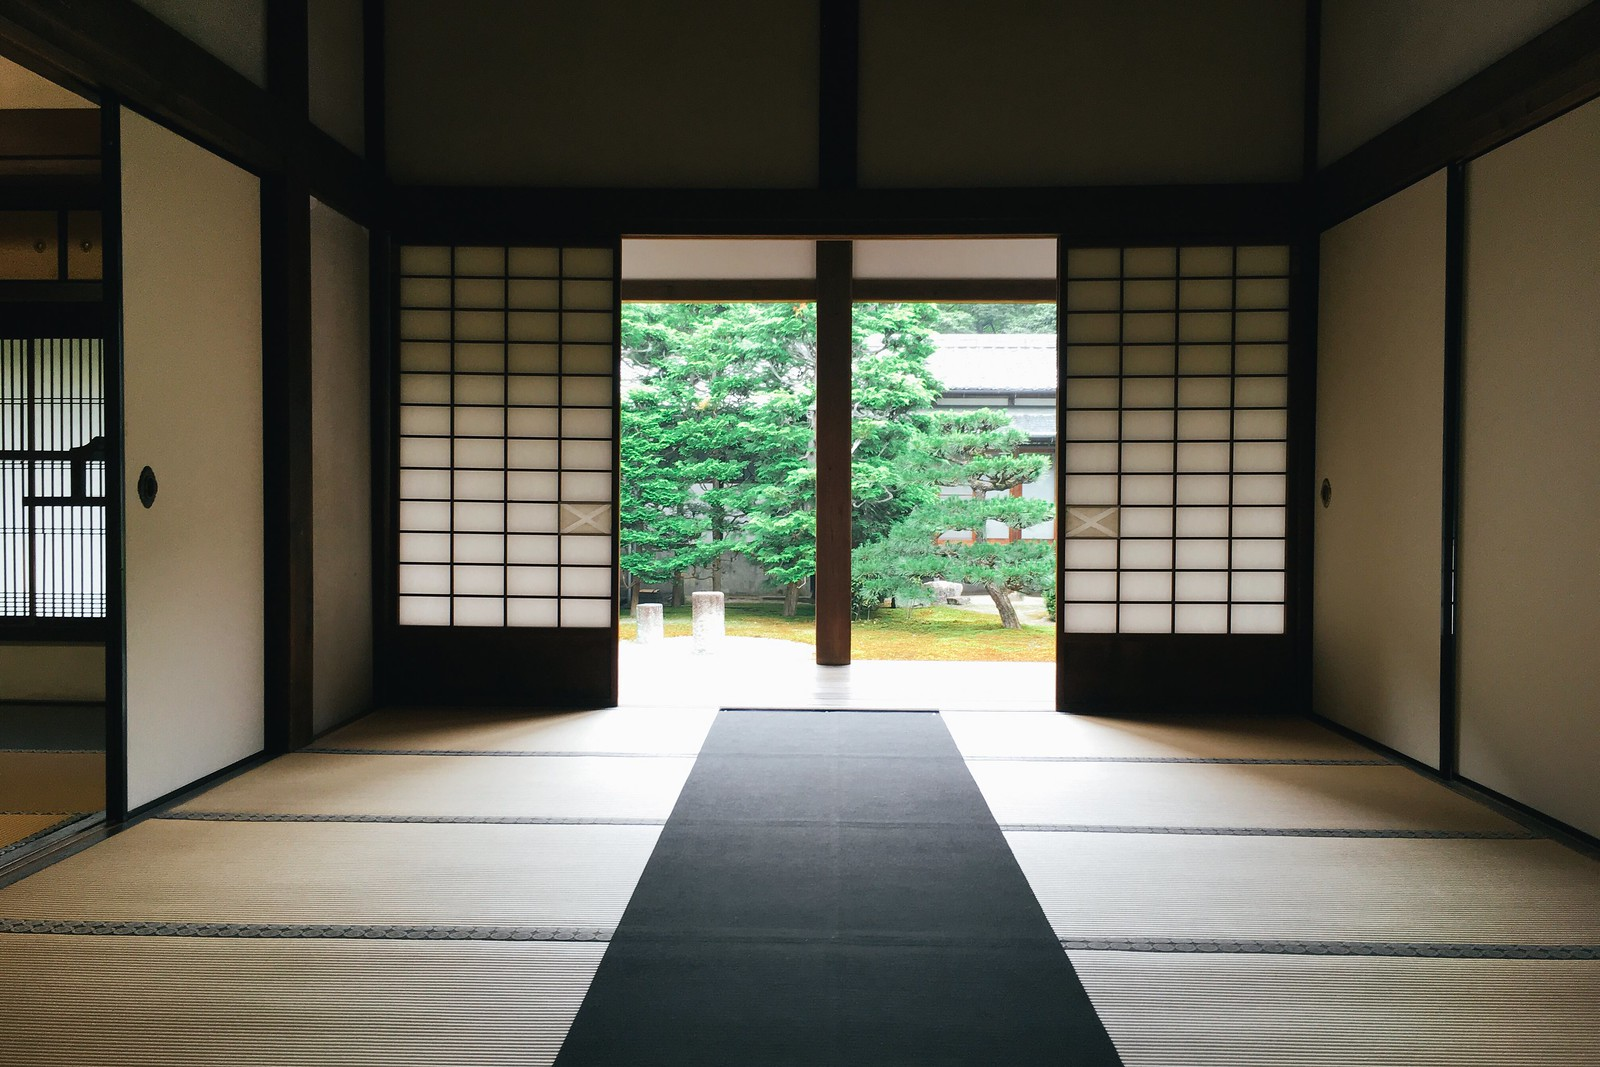 Tofukuji in Kyoto, Japan.